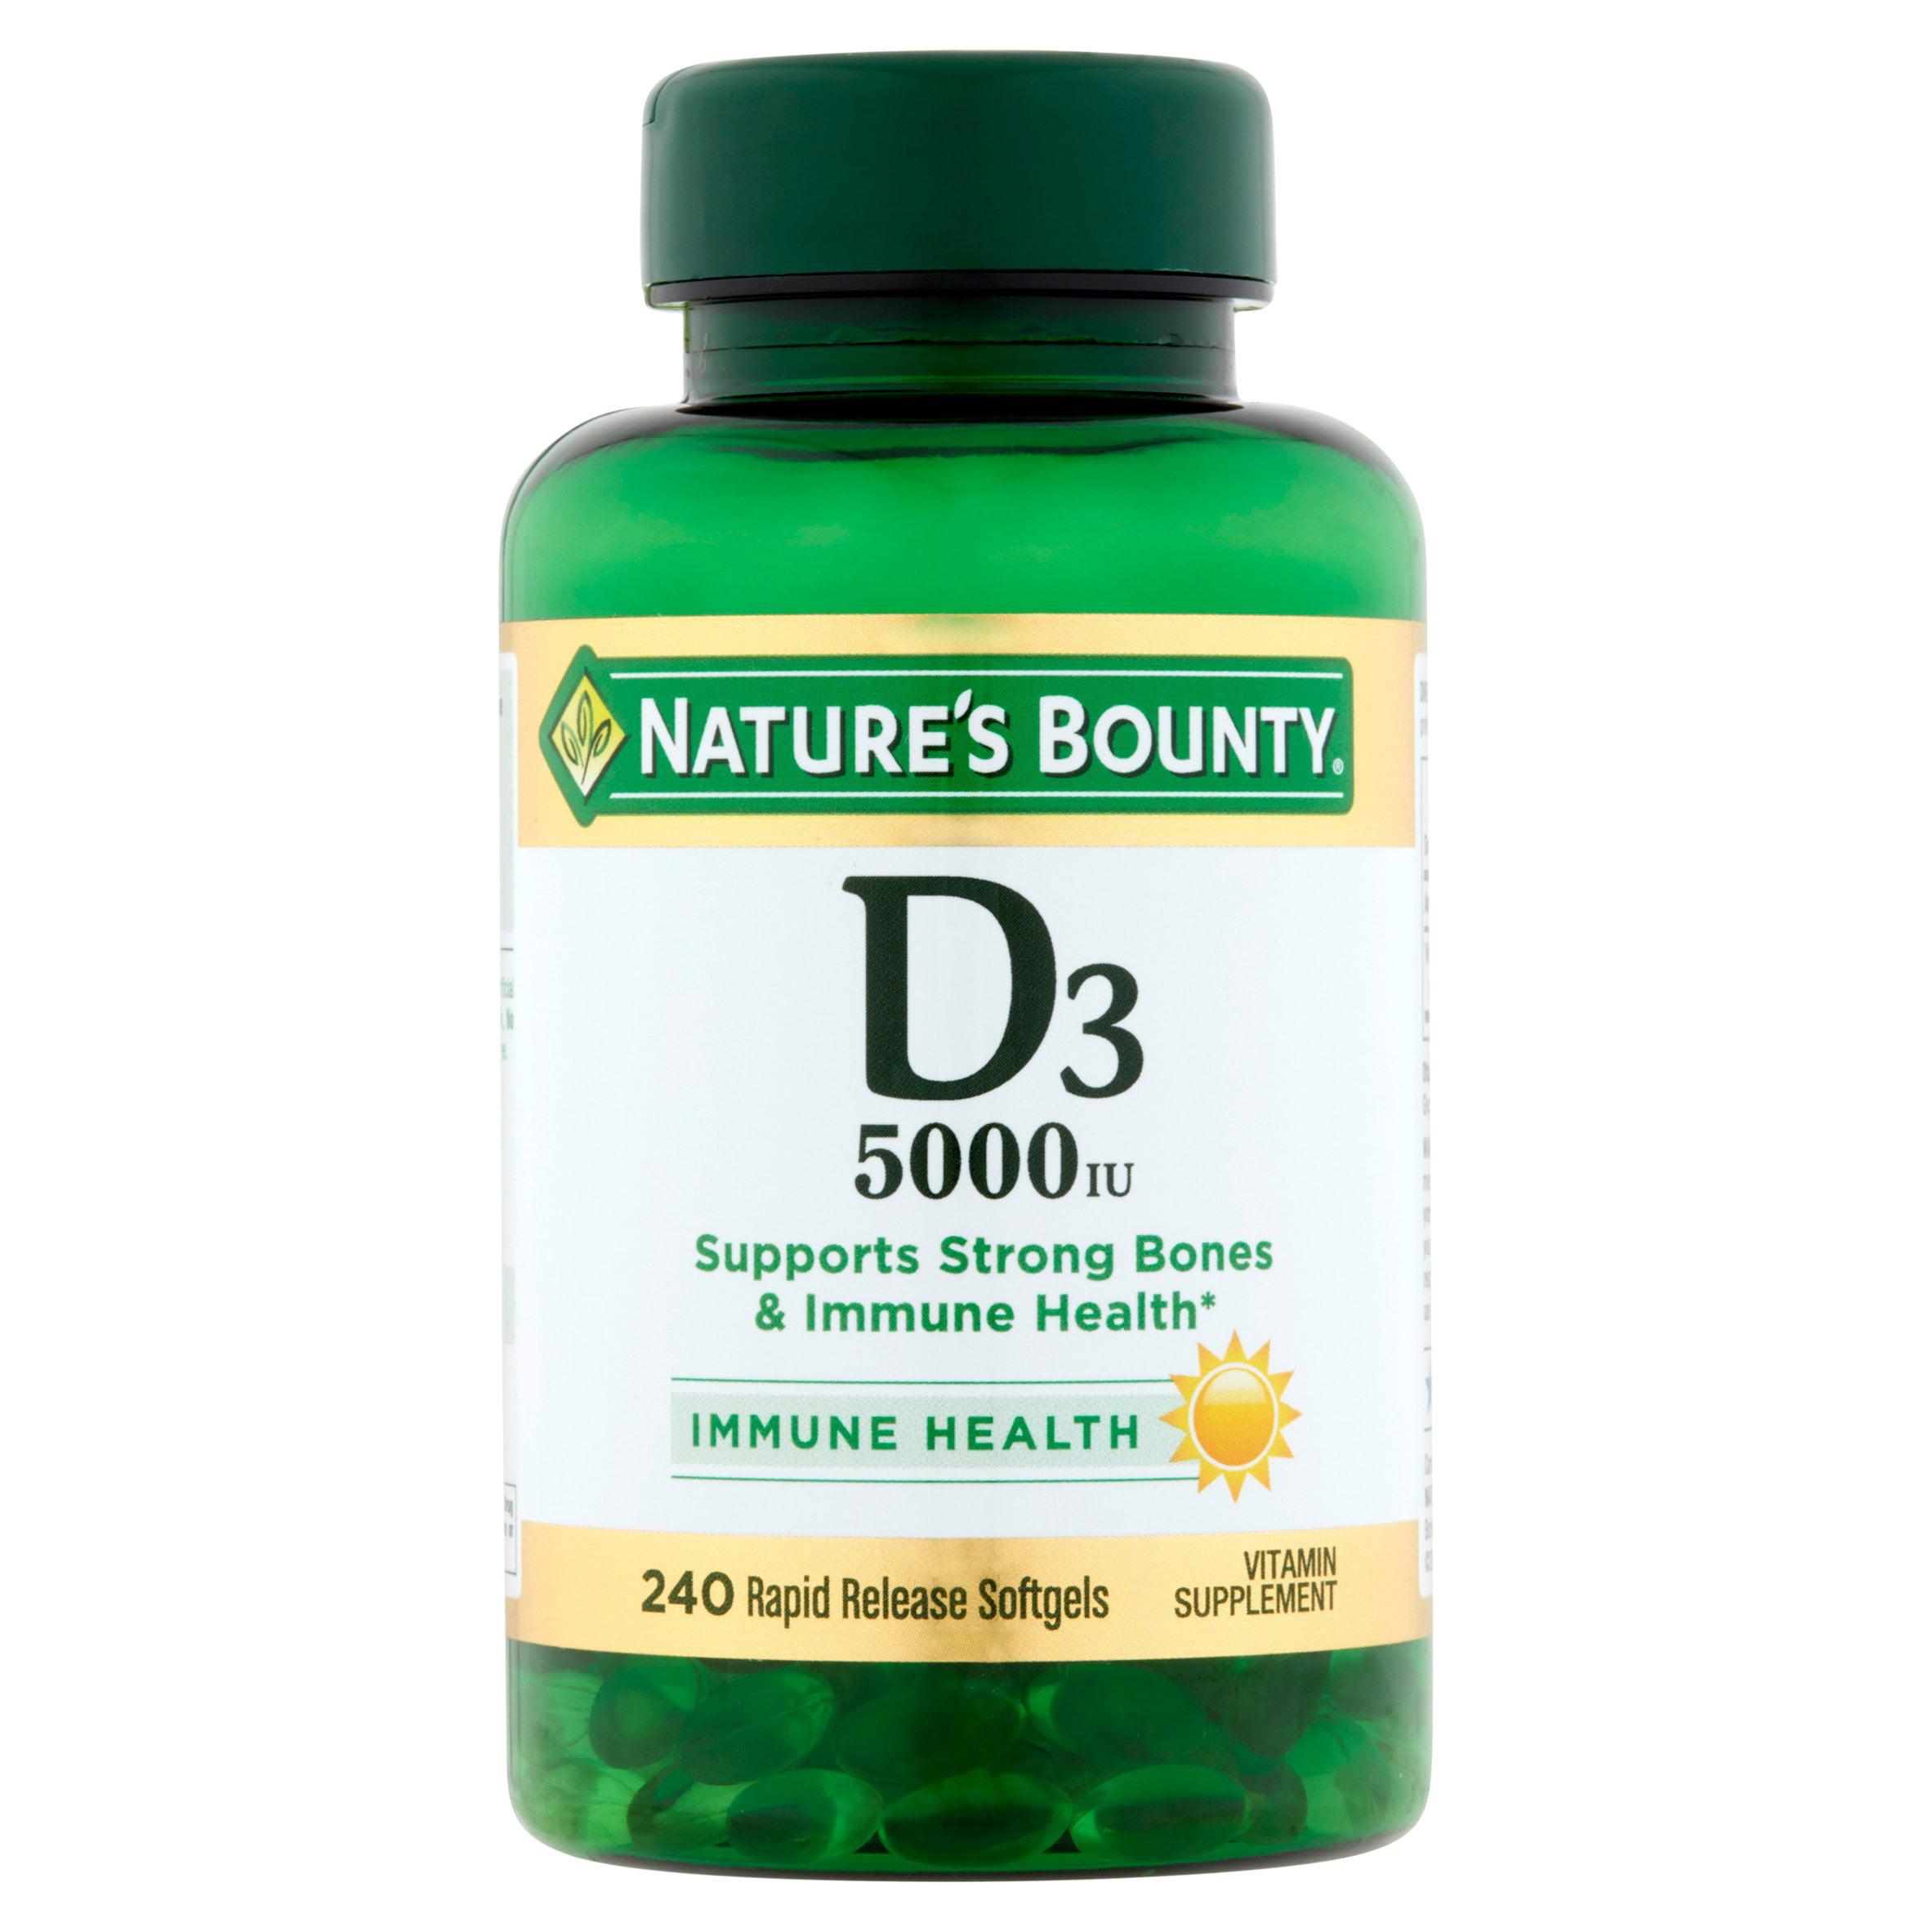 Nature's Bounty D3, 5000 IU Rapid Release Softgels, 200ct